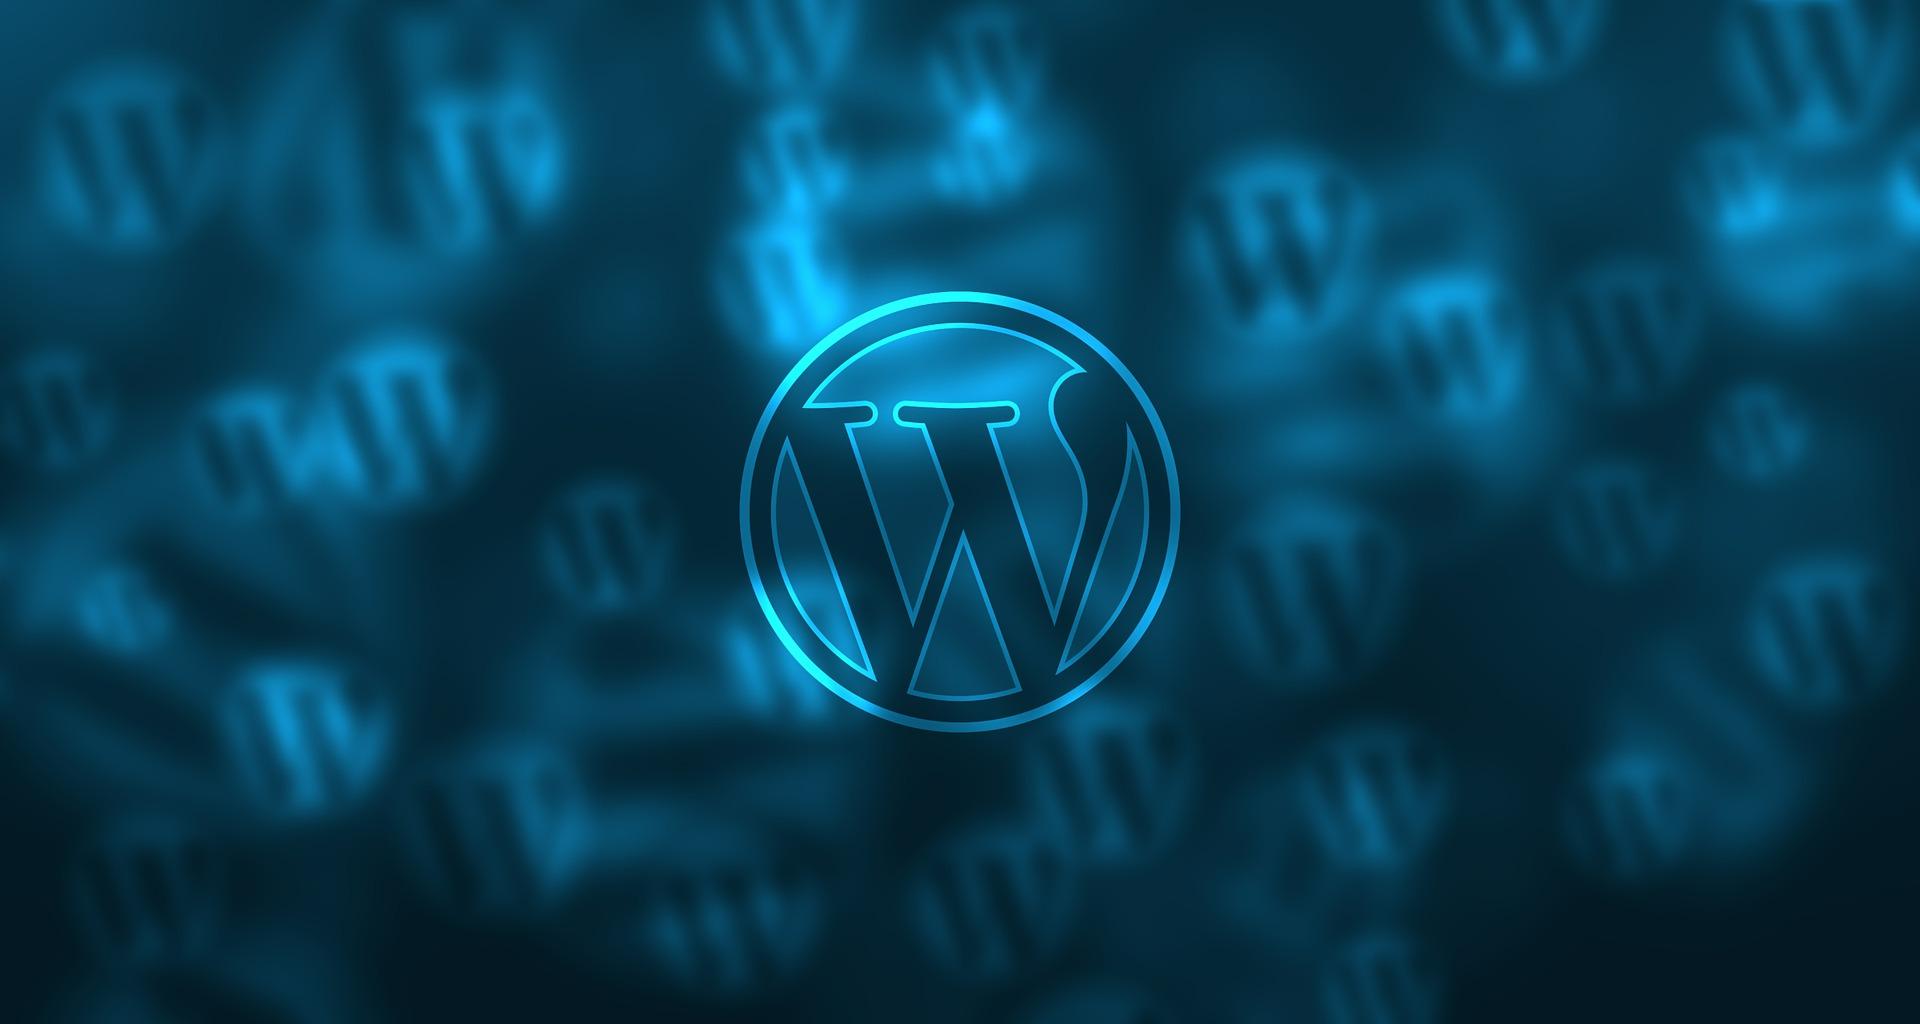 Background image wordpress - Wordpress Logo Blue Background Design